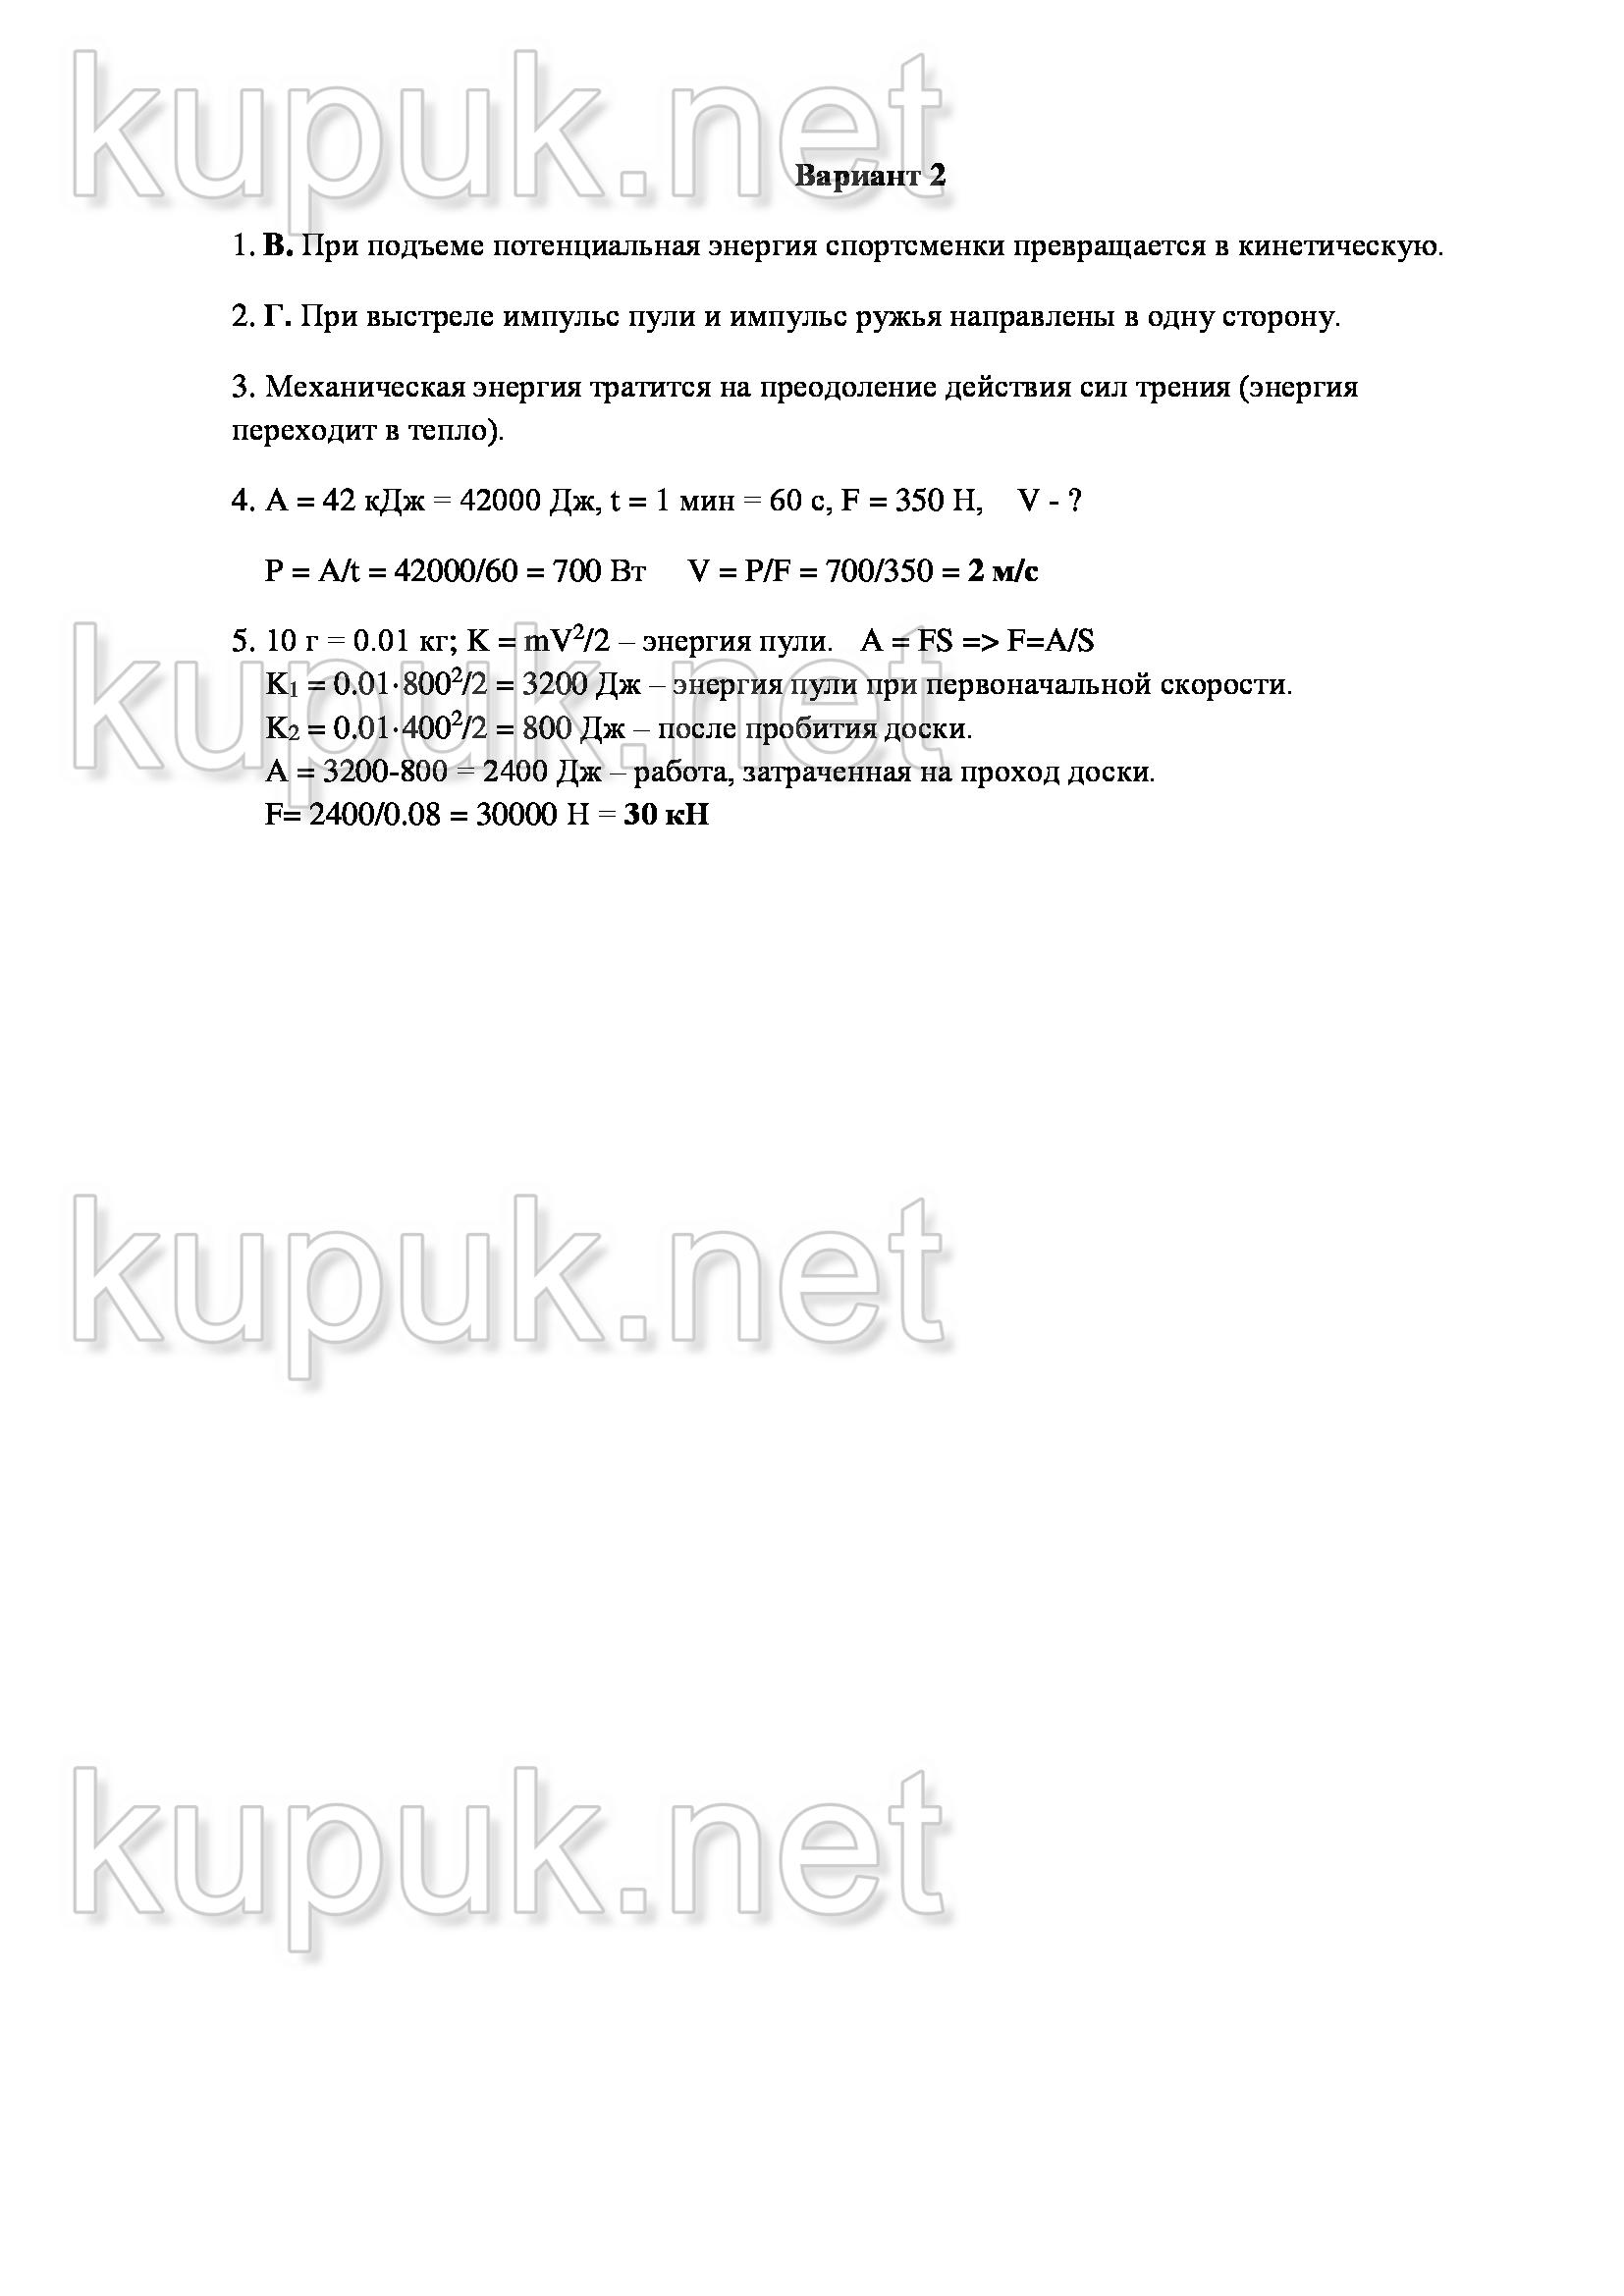 Л. A. Кирик Решебник 11 Класс